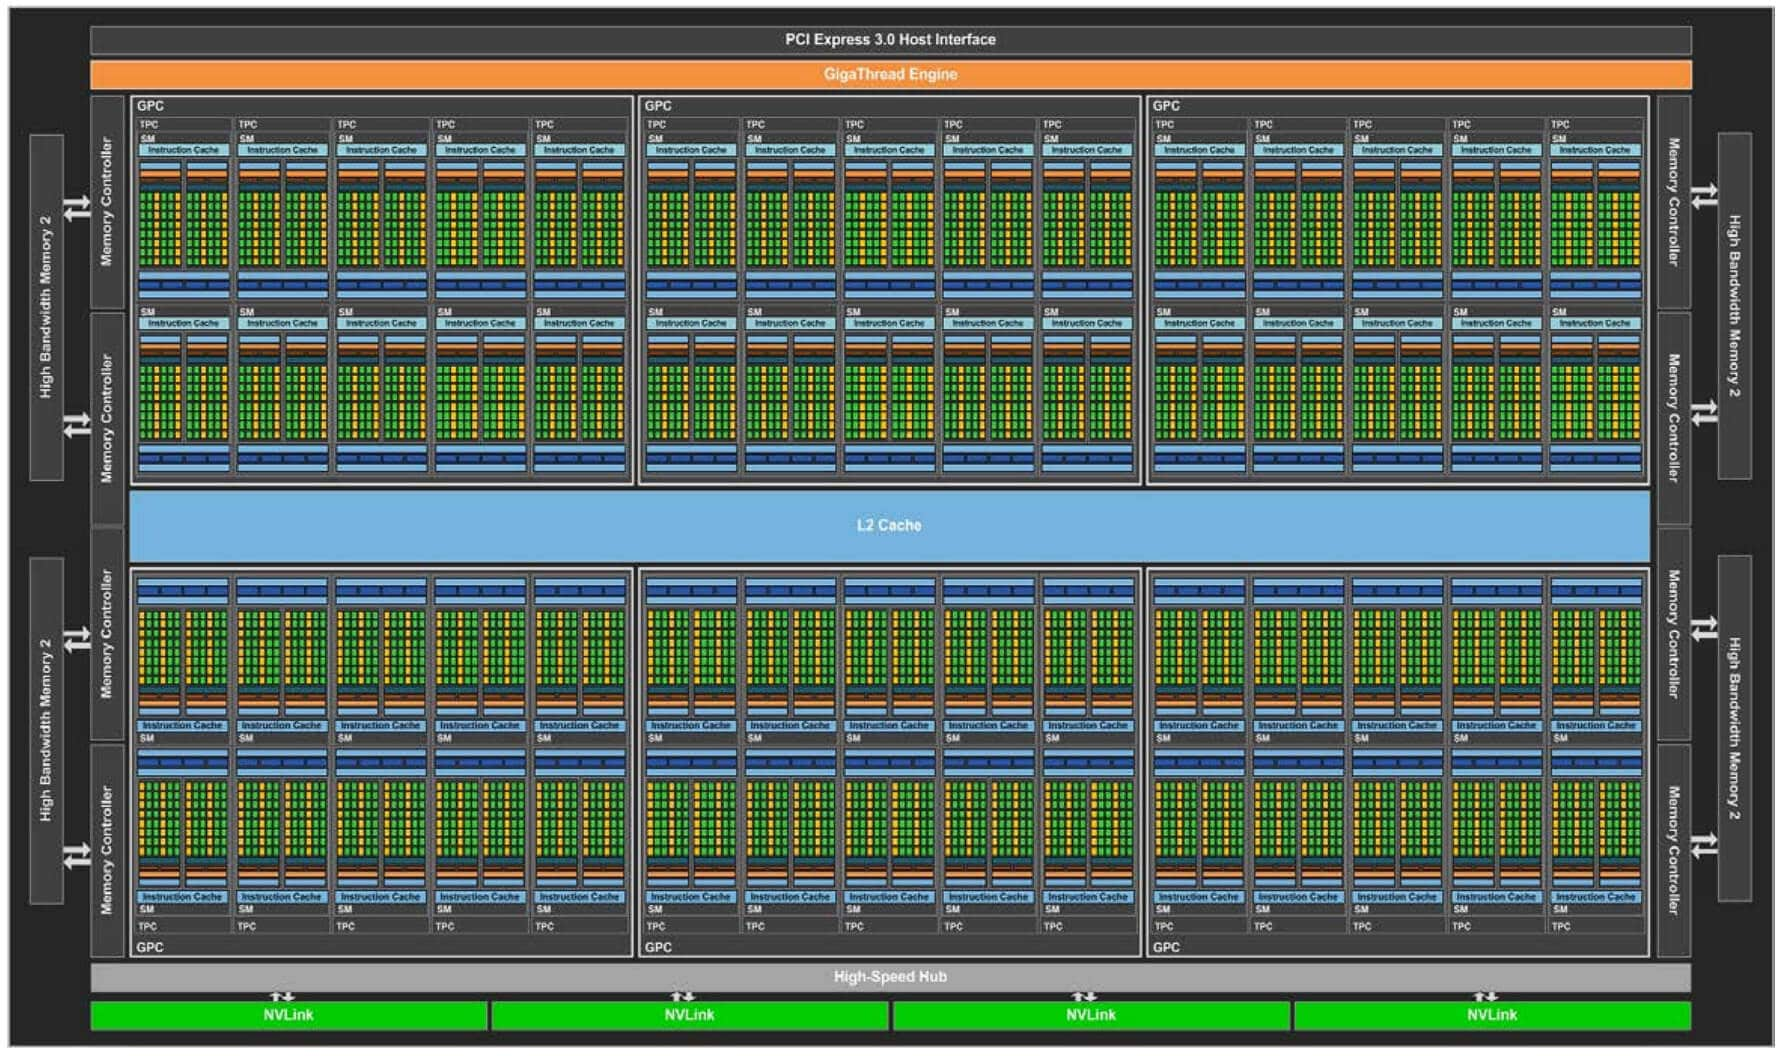 Nvidia GP100 Pascal Architecture Diagram